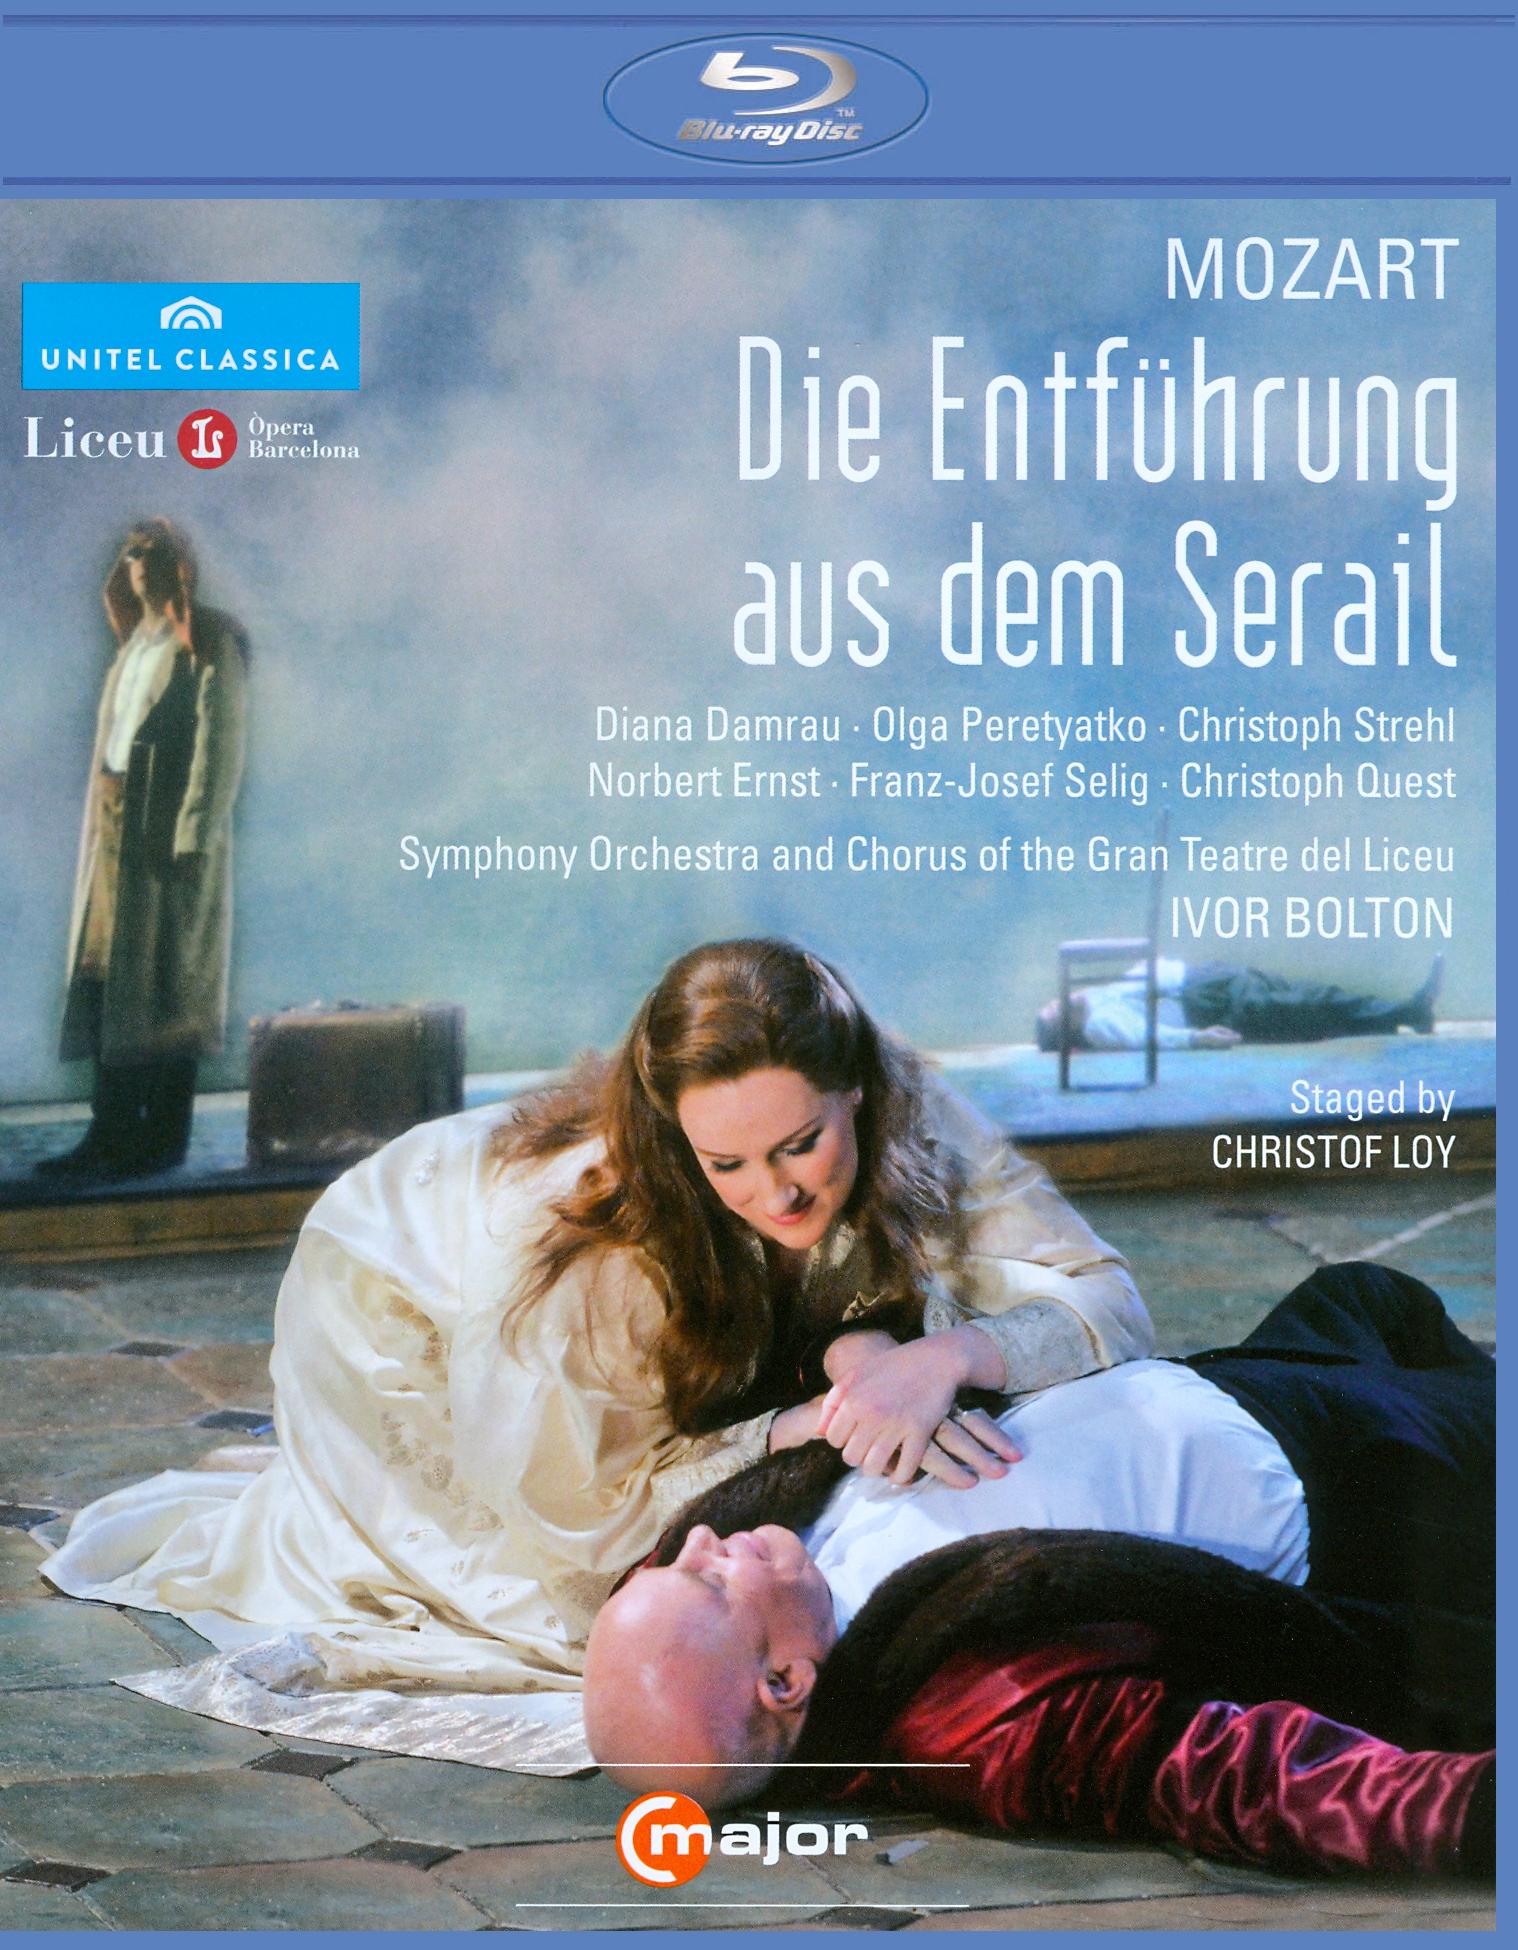 Die Entfuehrung aus dem Serail (Gran Teatre del Liceu)